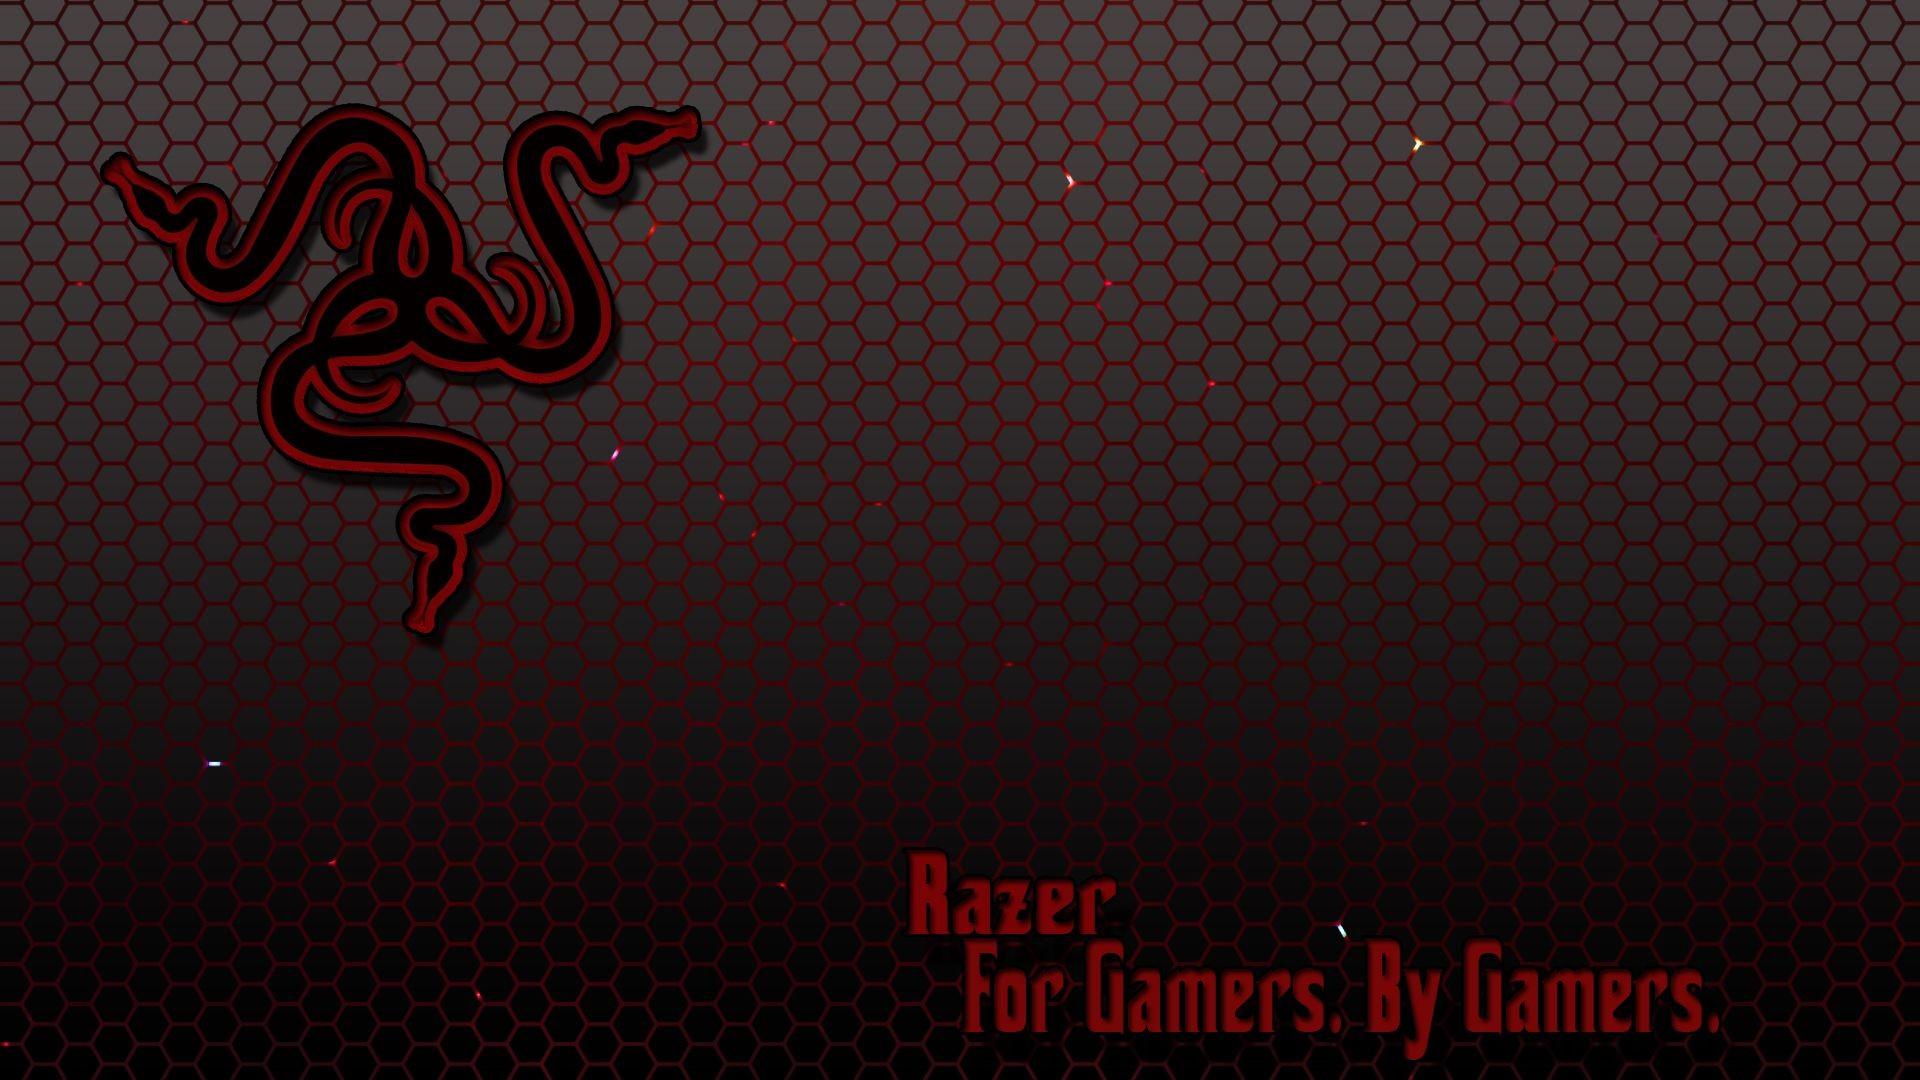 Dzd 1080p wallpaper razer revamp red by dzdigital on deviantart html – Dzd  1080p Wallpaper Razer